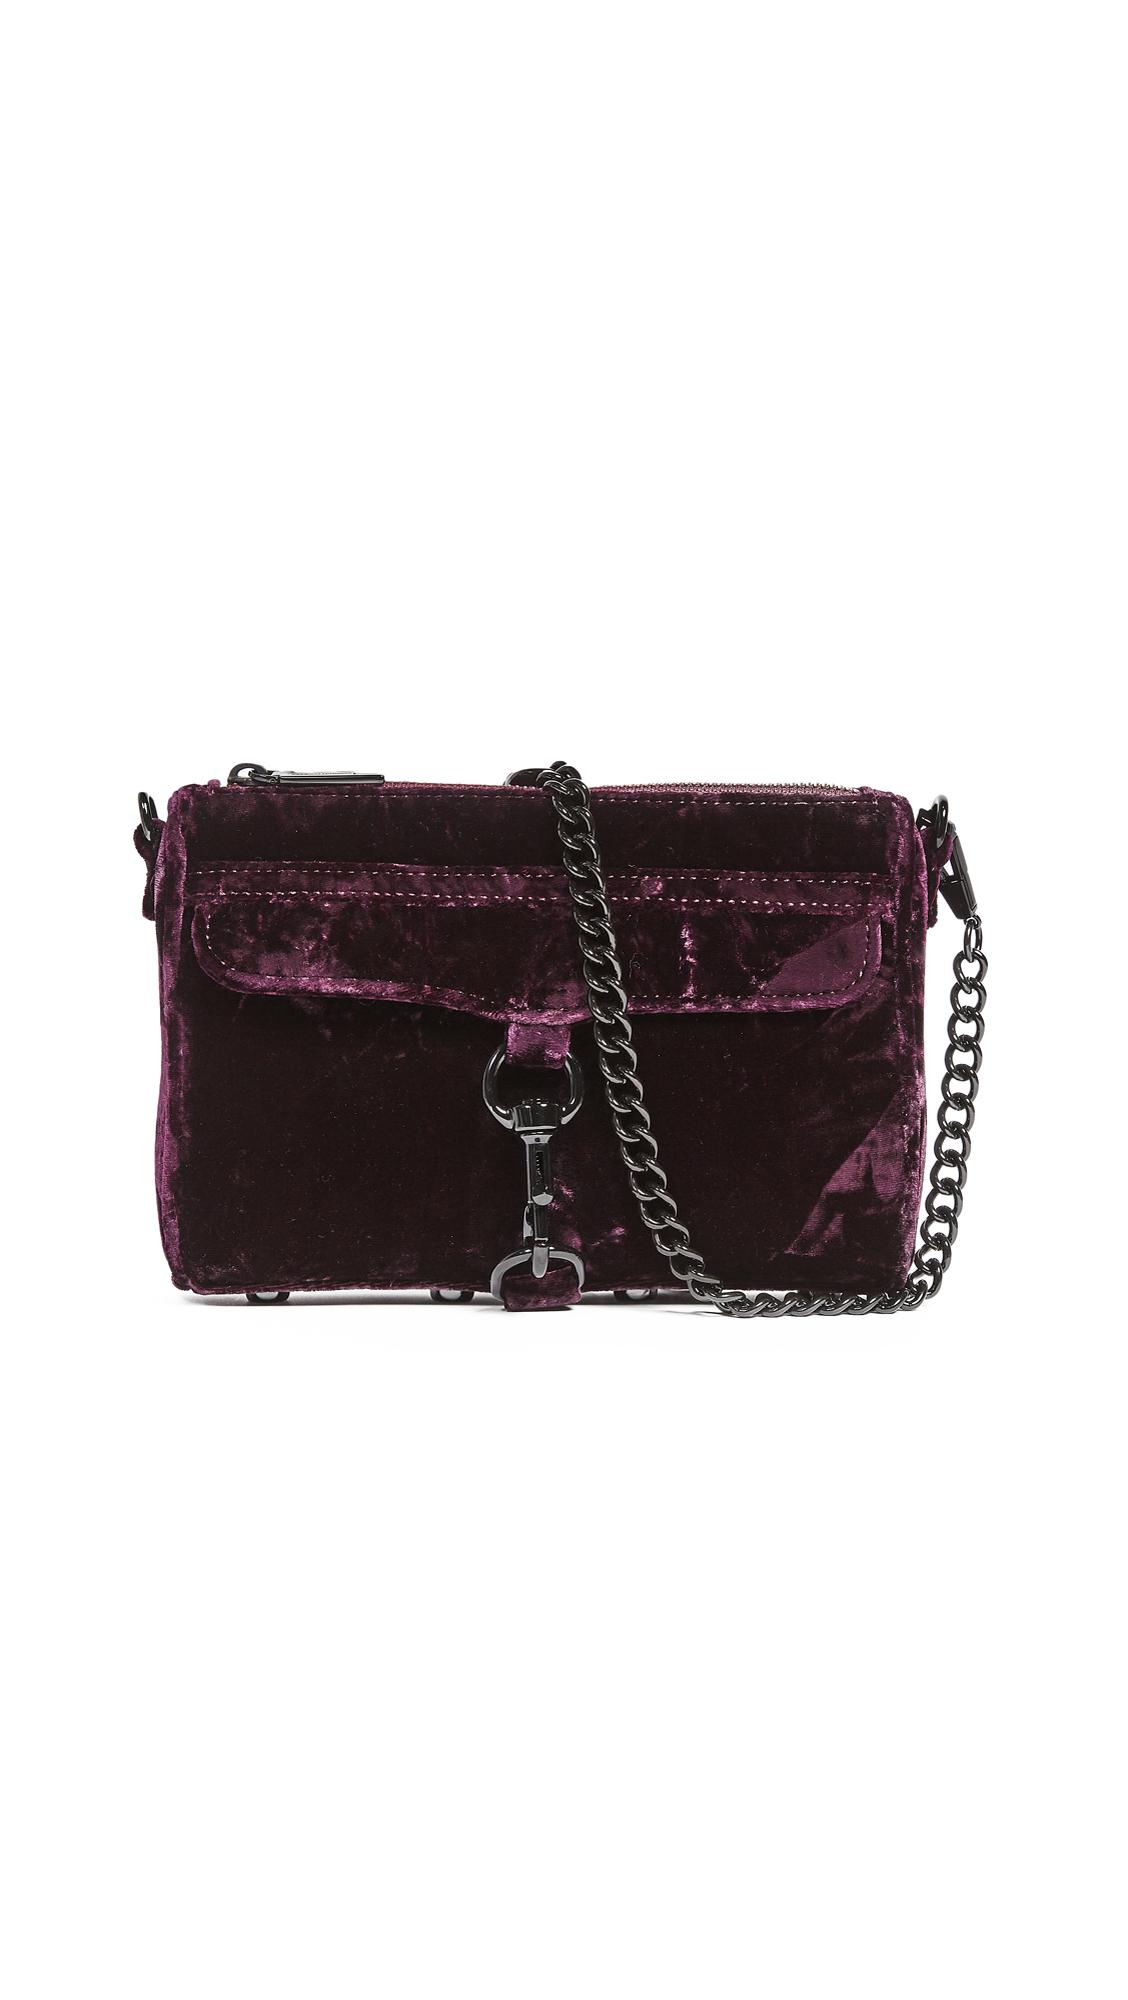 Rebecca Minkoff Mini MAC Bag - Dark Cherry